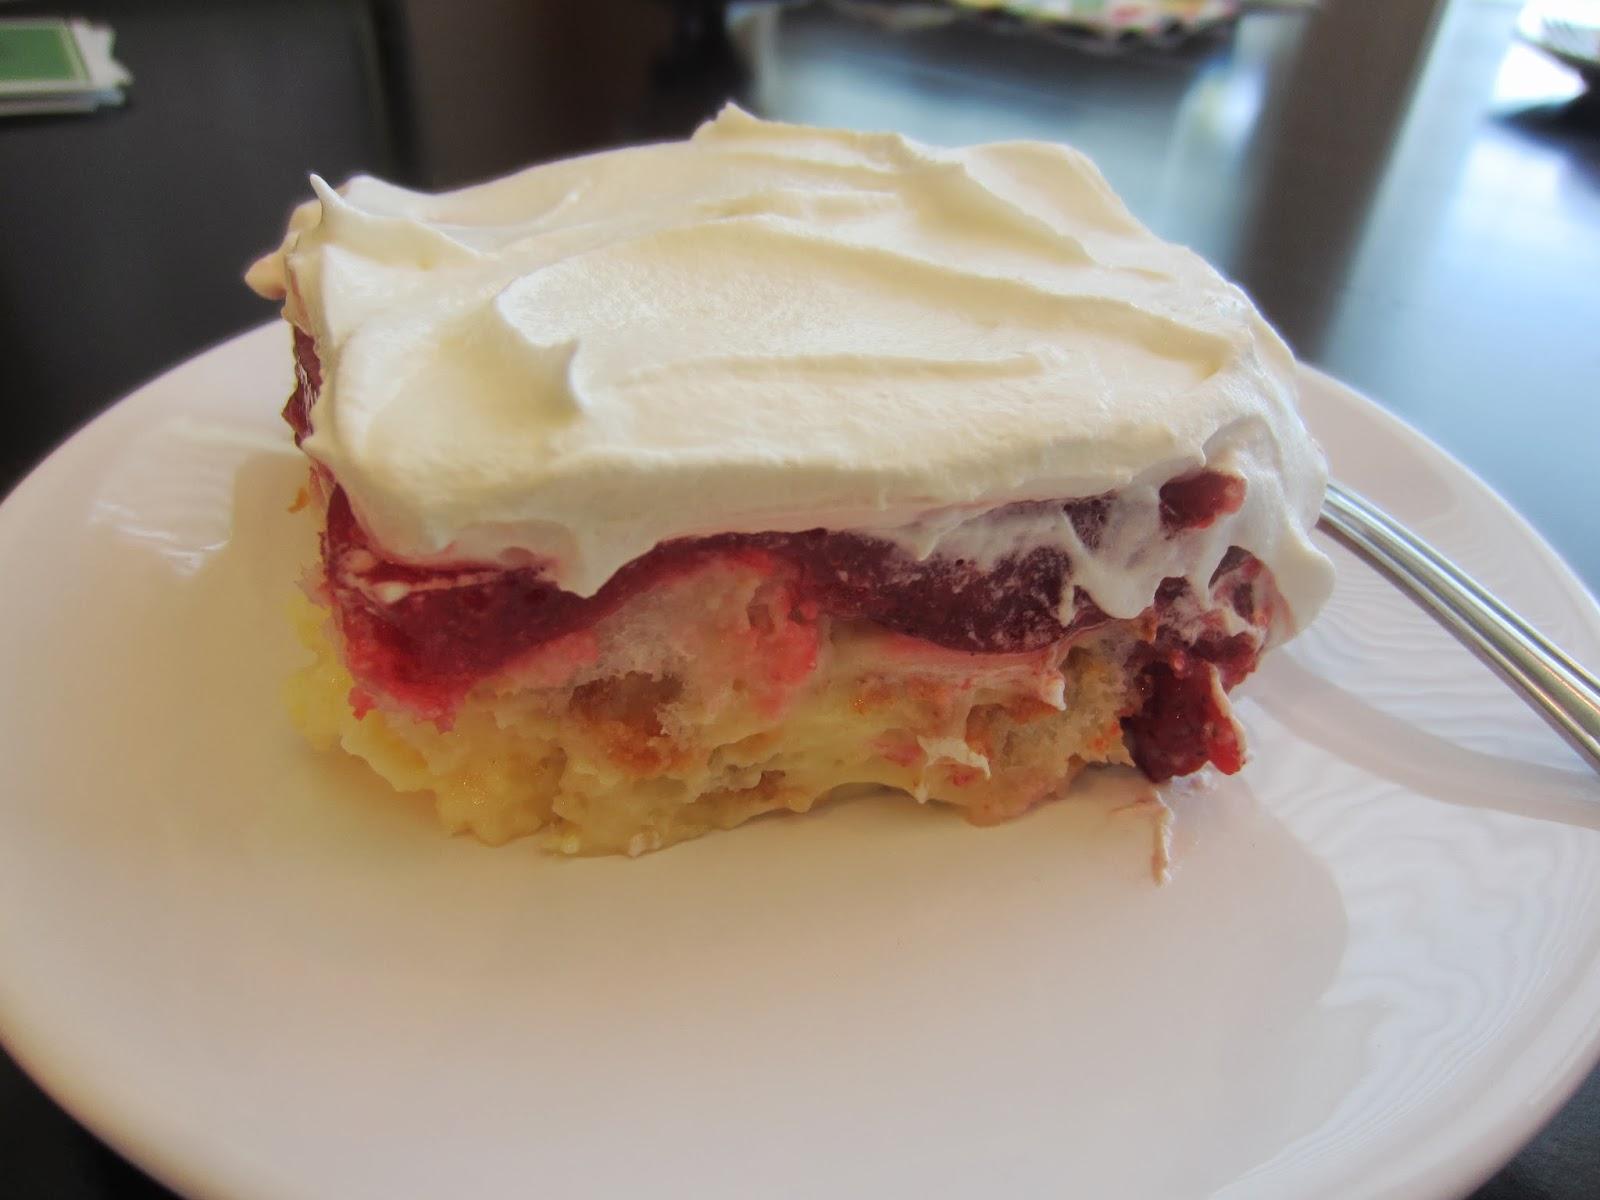 Strawberry Jello Cake Recipe With Pudding: My Patchwork Quilt: STRAWBERRY ANGEL DESSERT